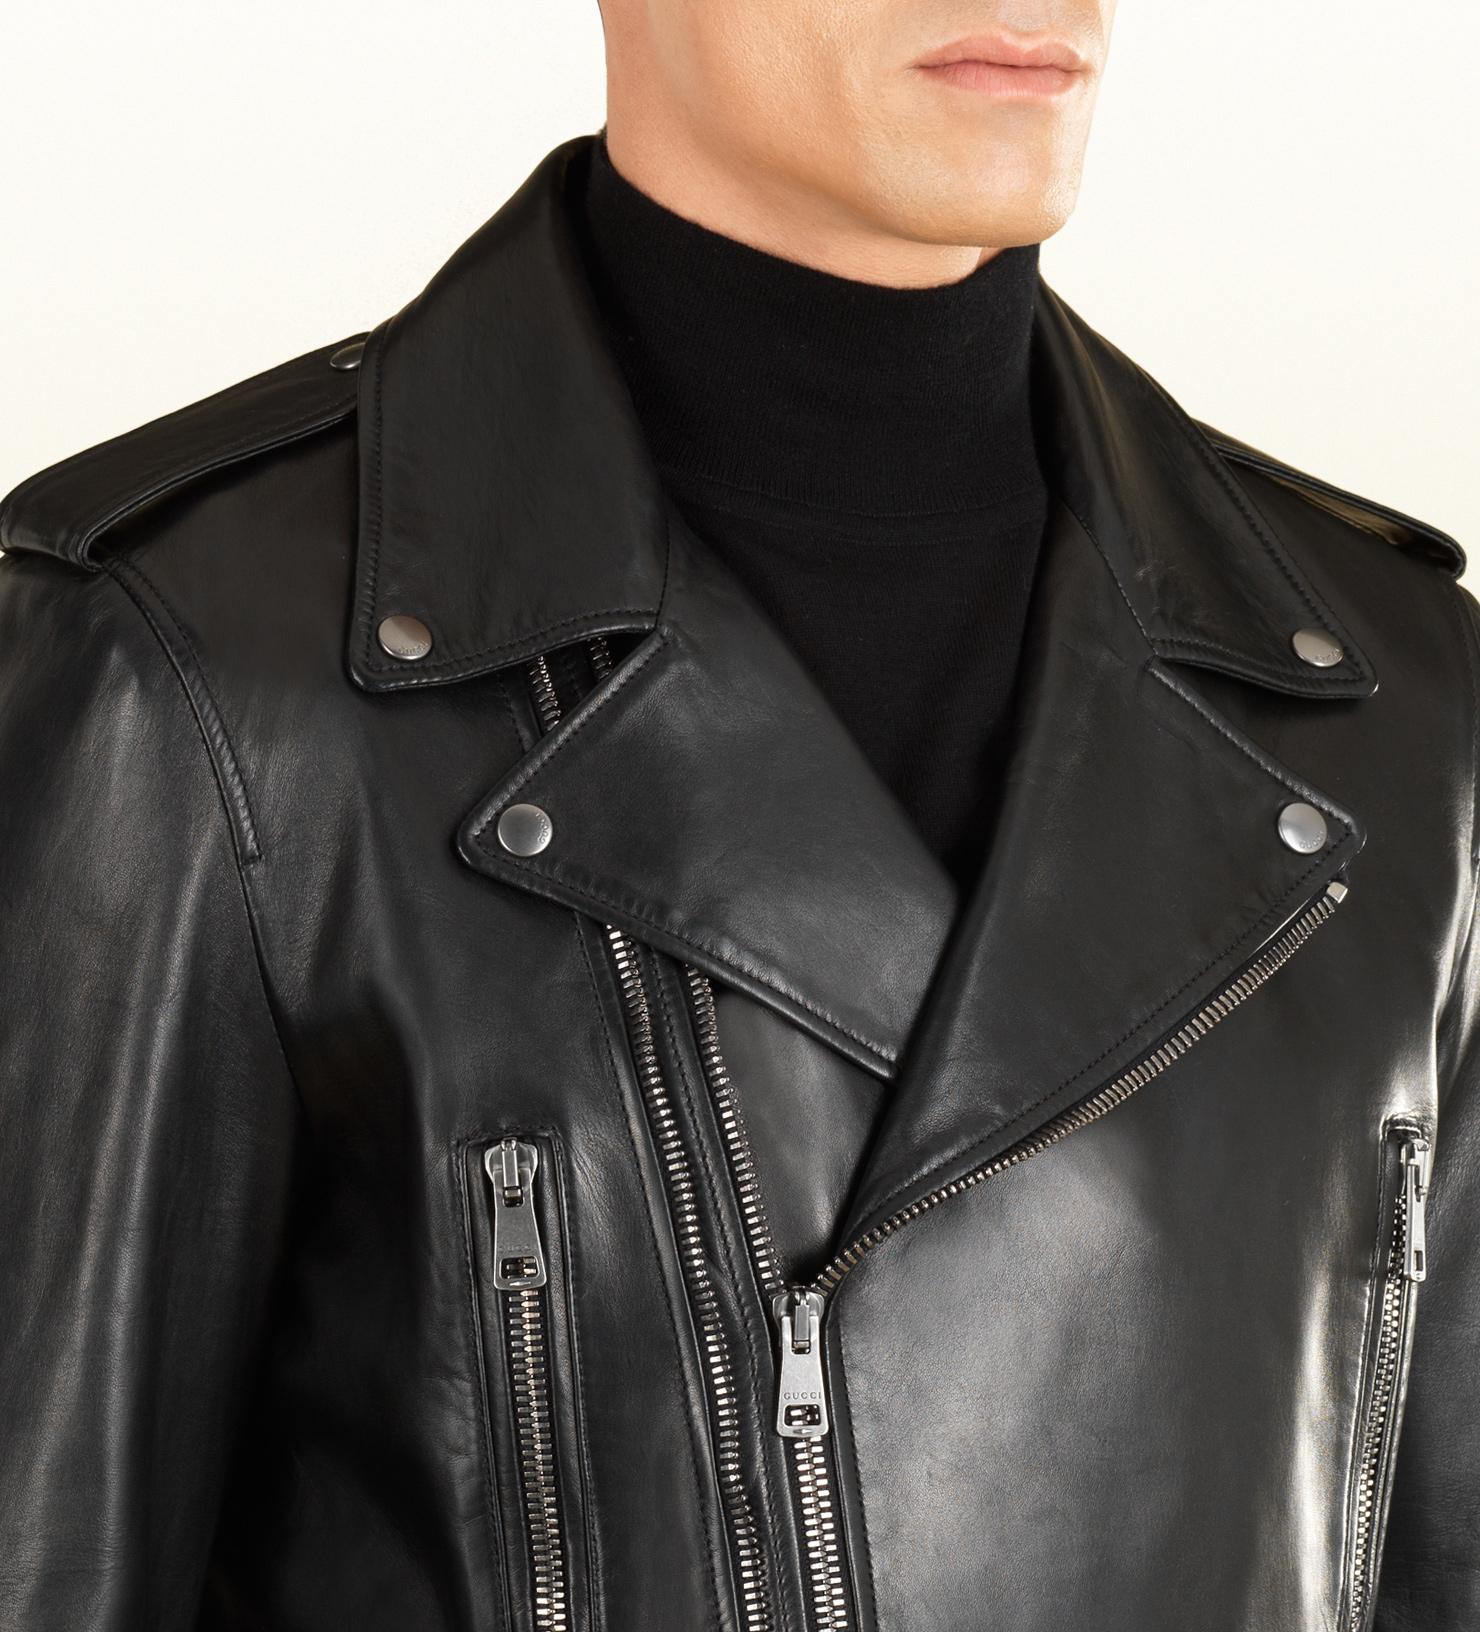 Lyst - Gucci Leather Biker Jacket in Black for Men